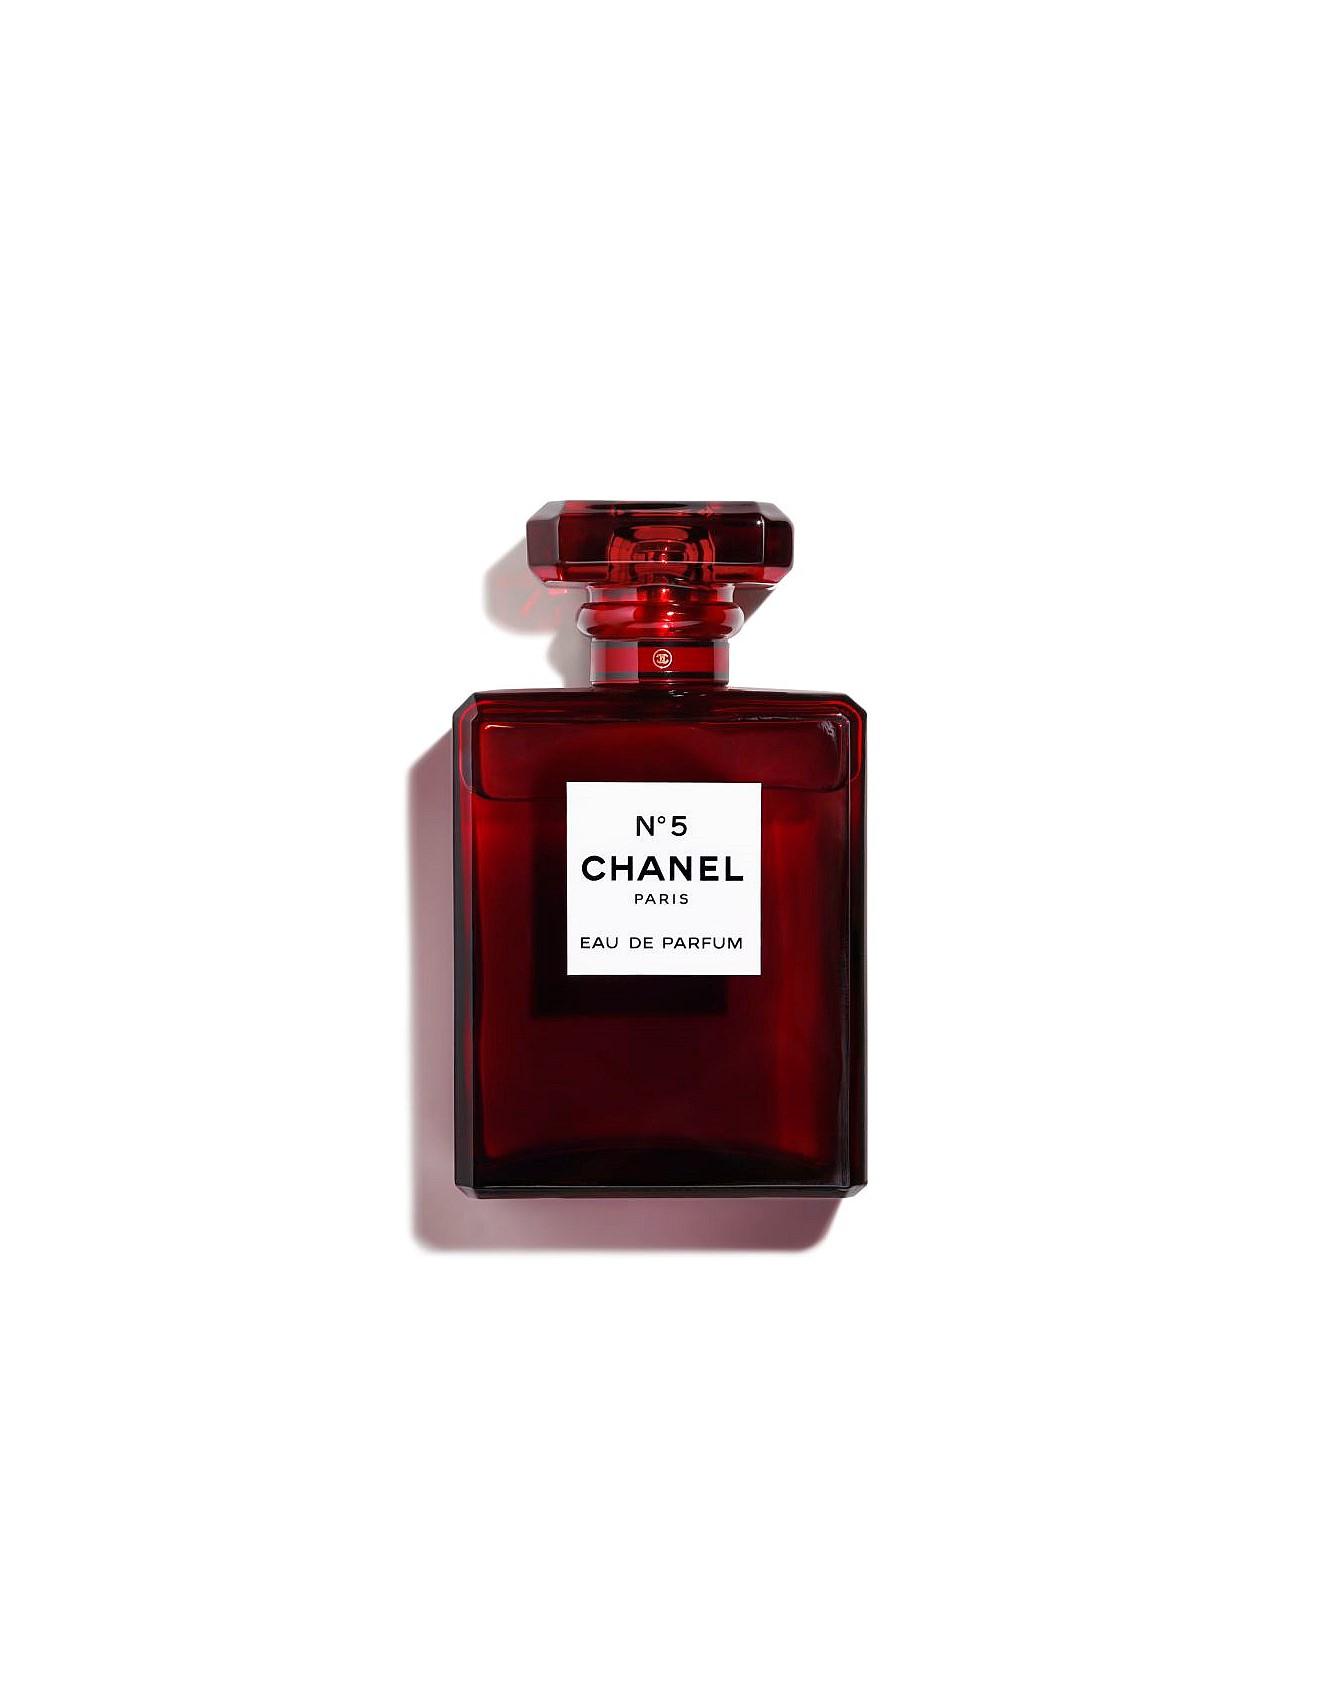 Chanel Coco Chanel Chanel Perfume Makeup David Jones N5